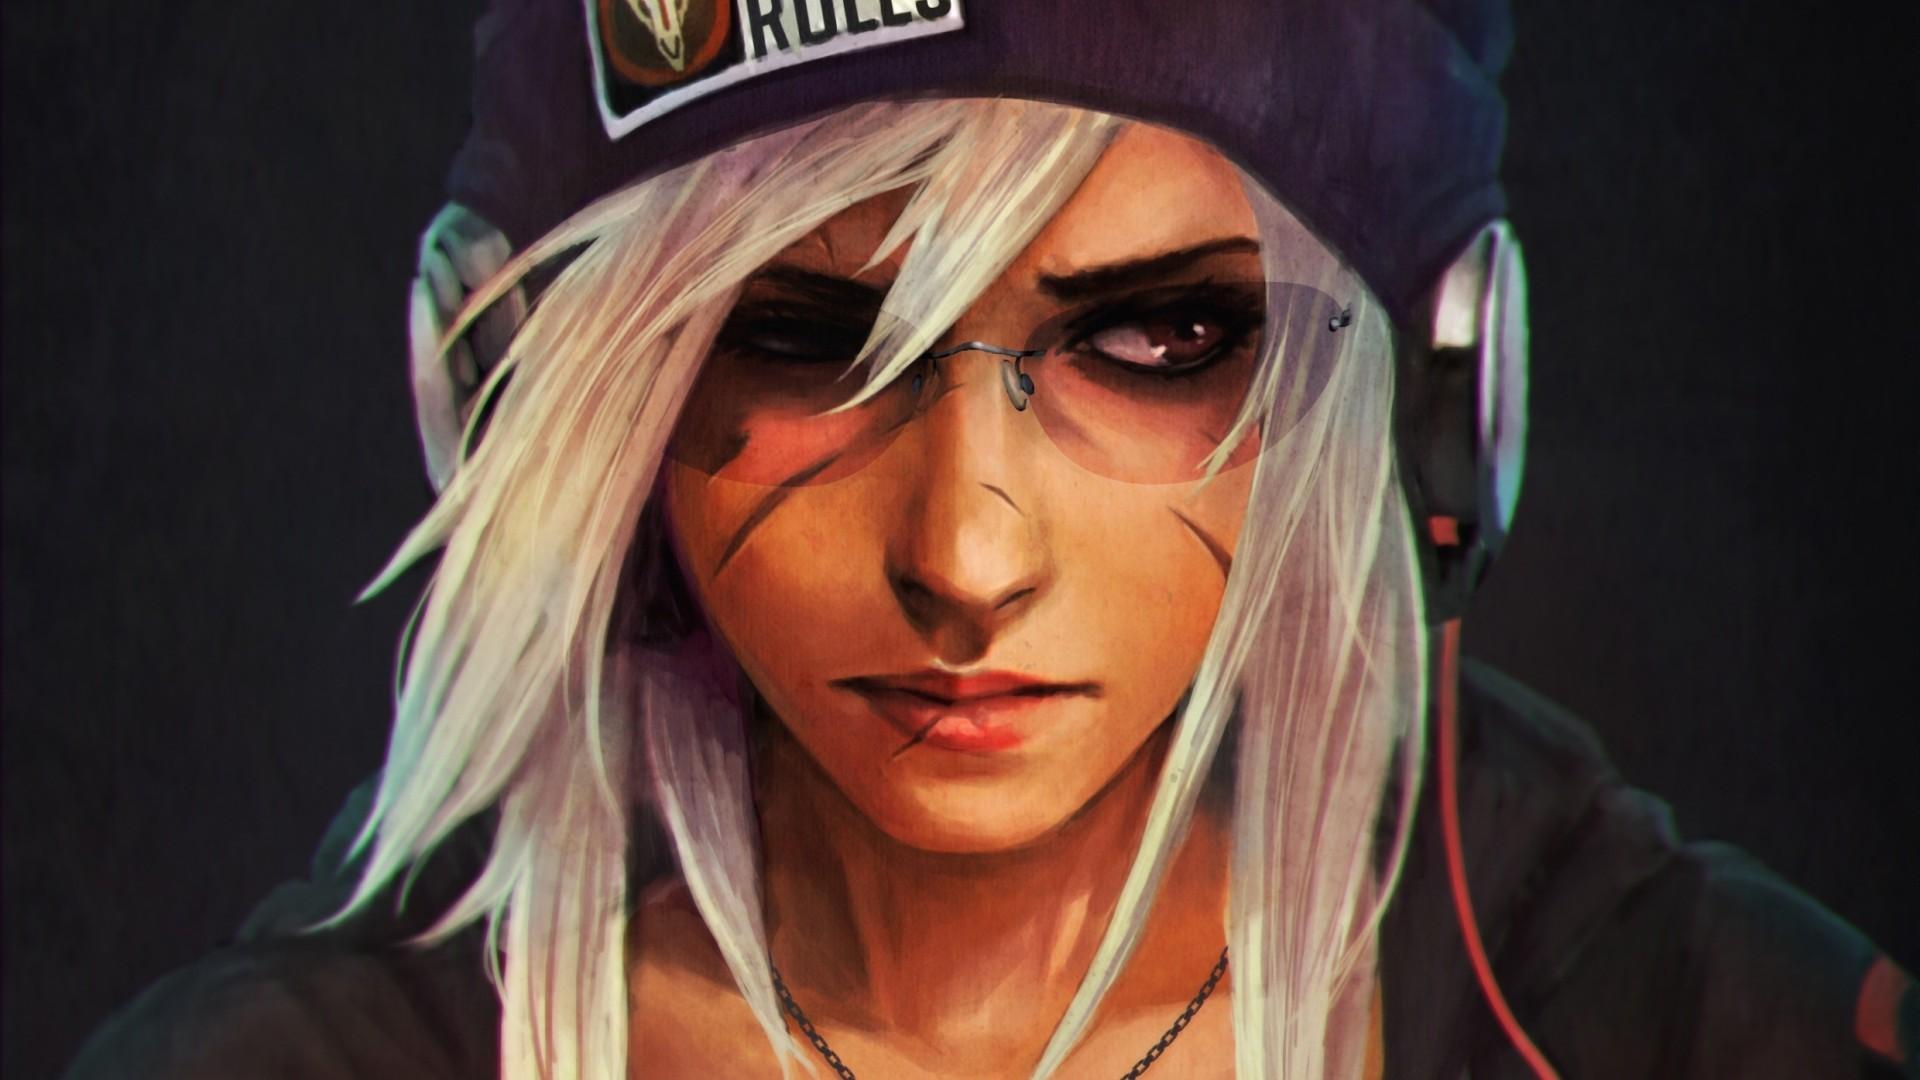 Wallpaper Video Games Glasses Reaper Overwatch Blizzard